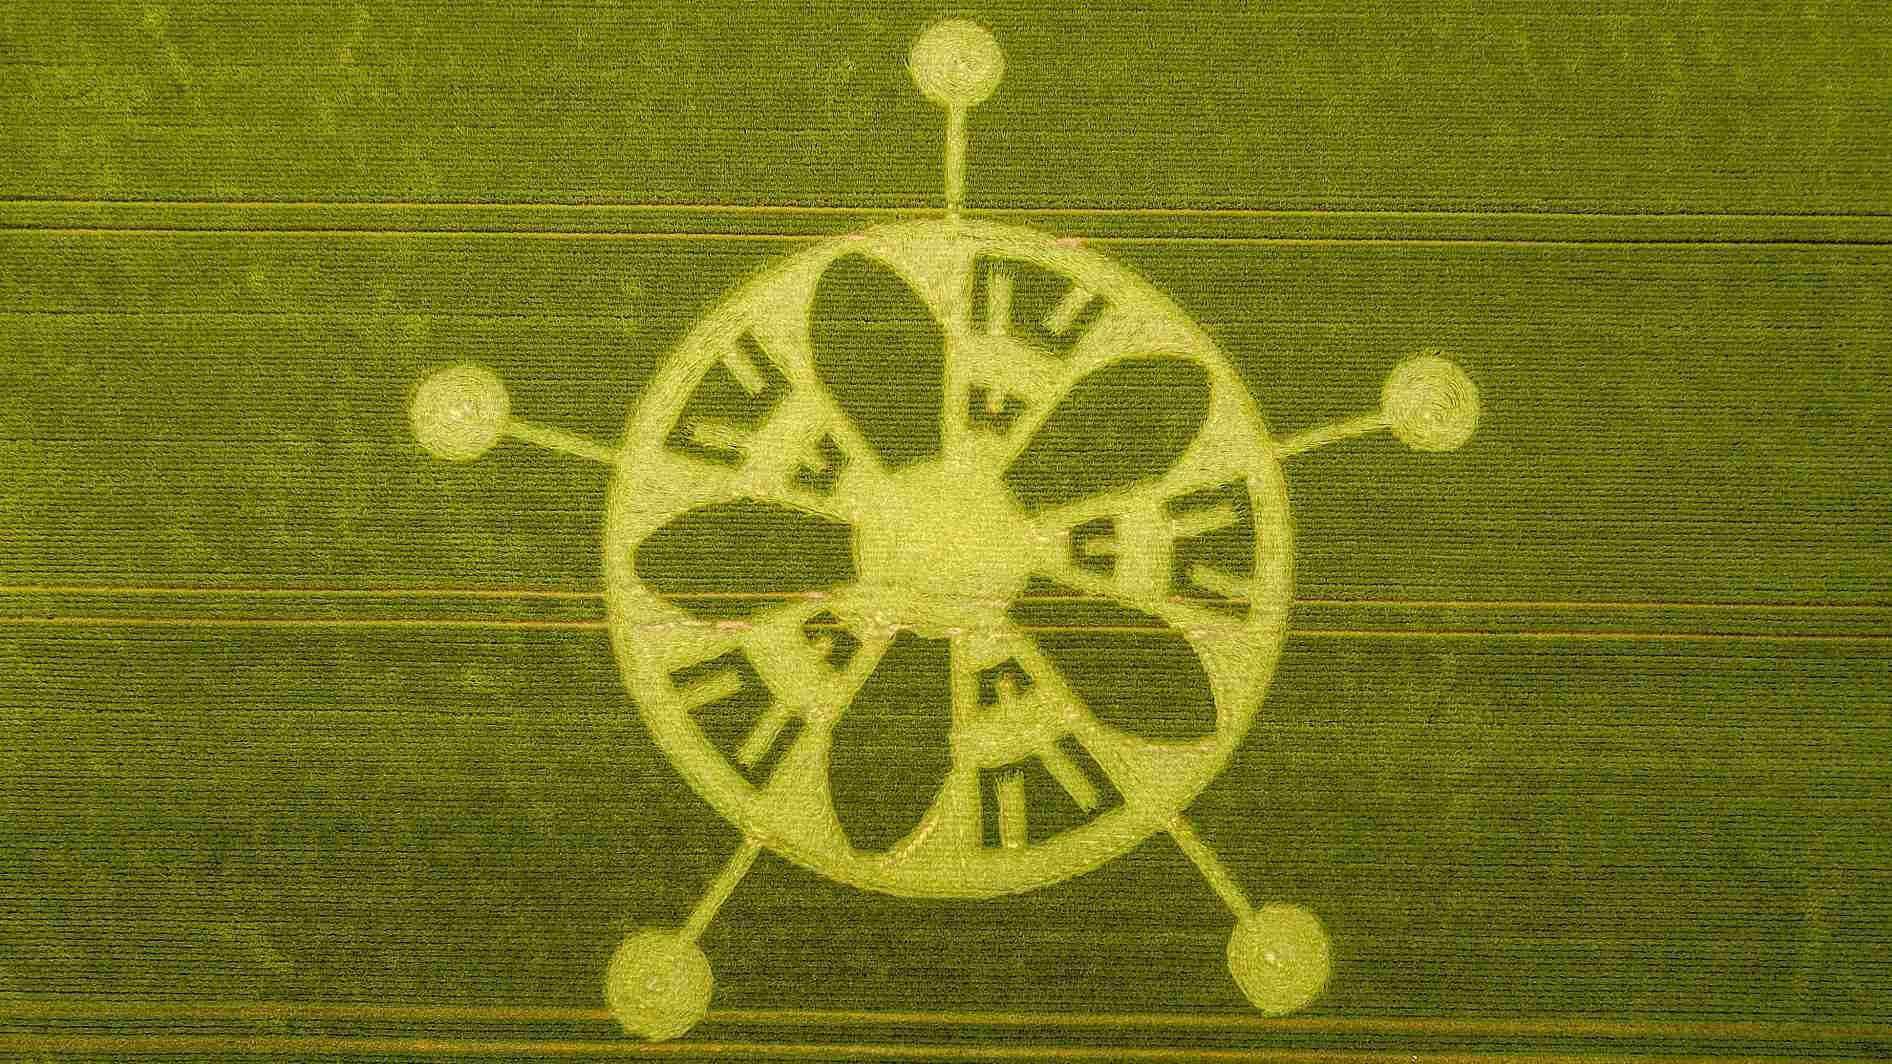 Crop circle appears in field near Stonehenge